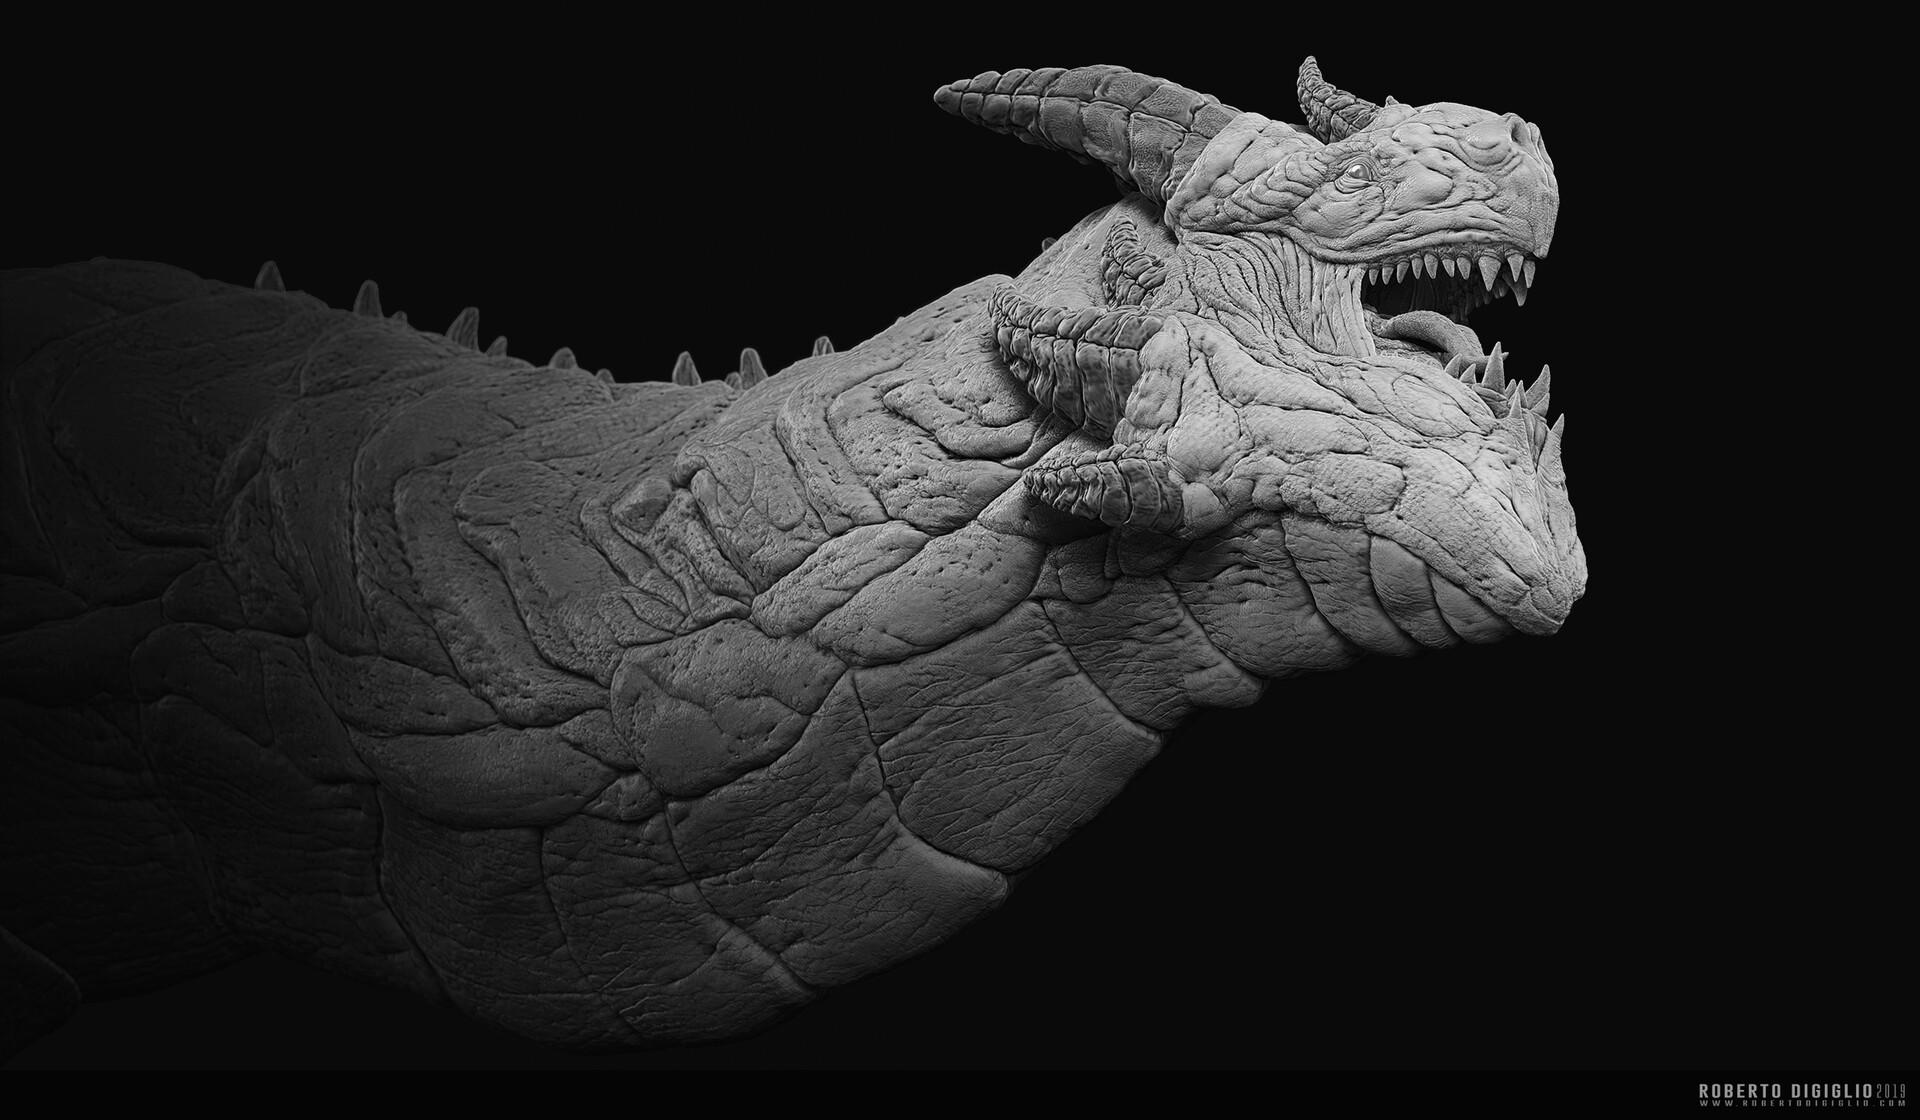 Roberto digiglio dragondoodle3